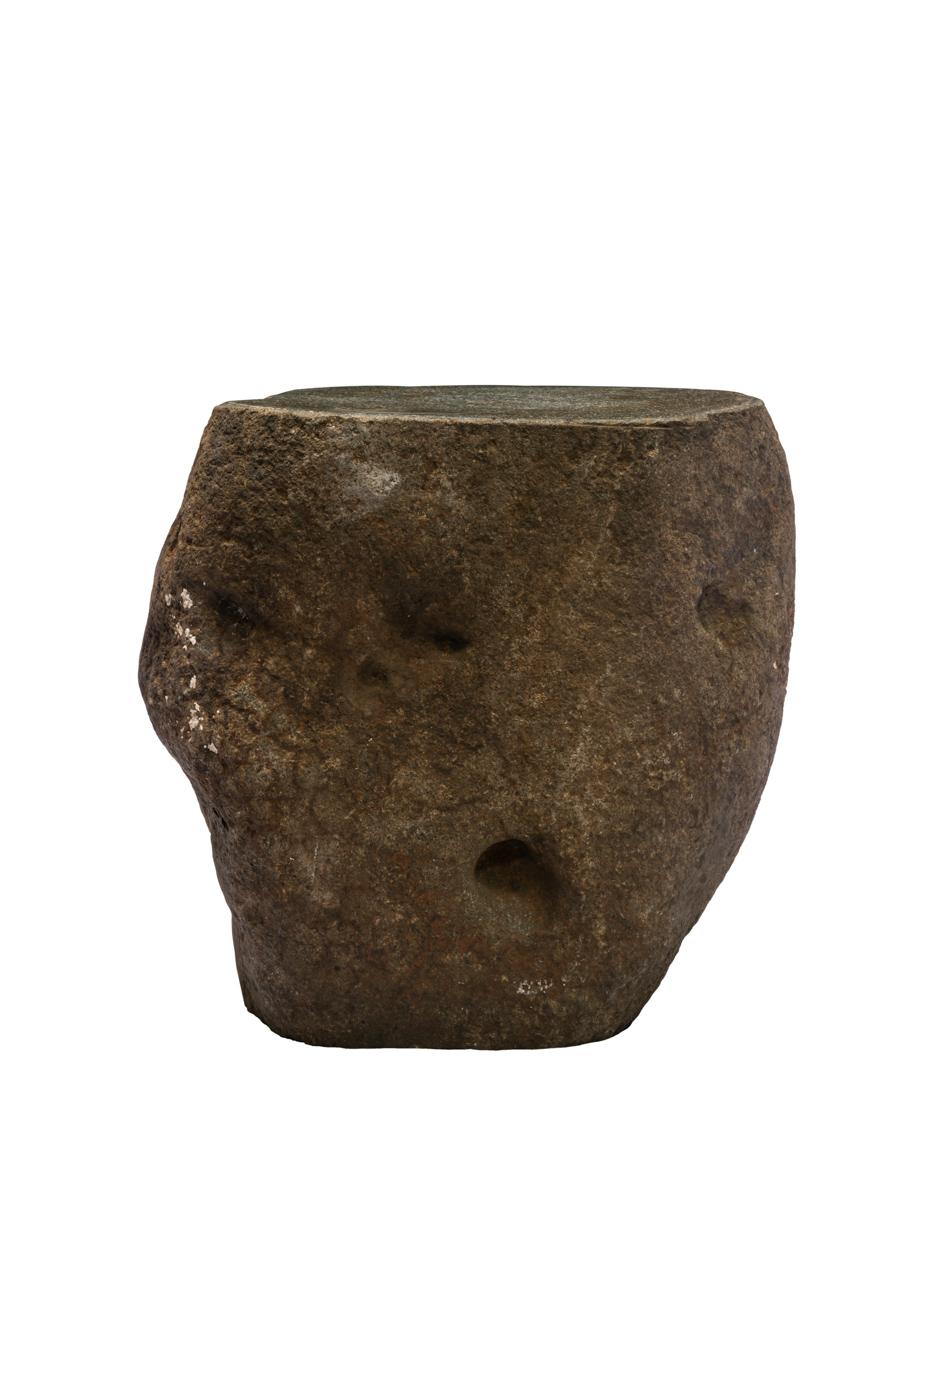 Taburete de piedra natural